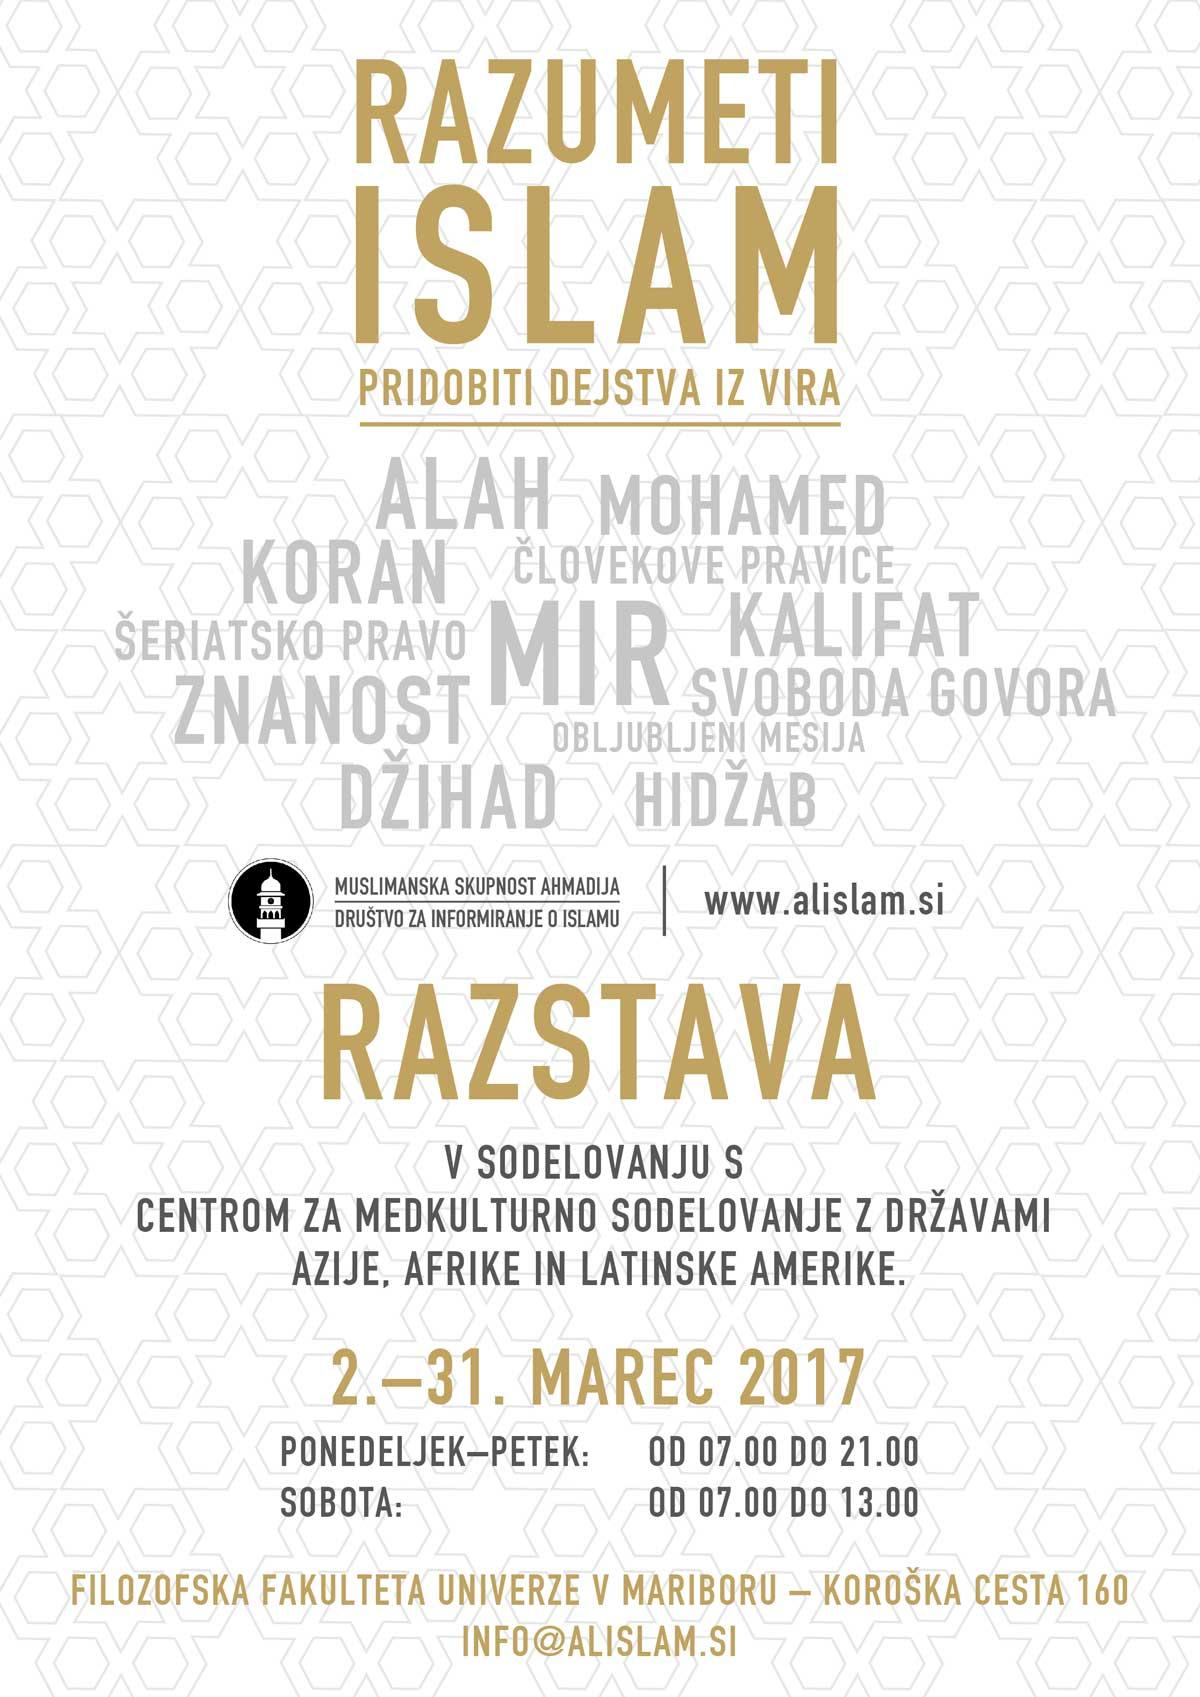 razstava razumeti islam